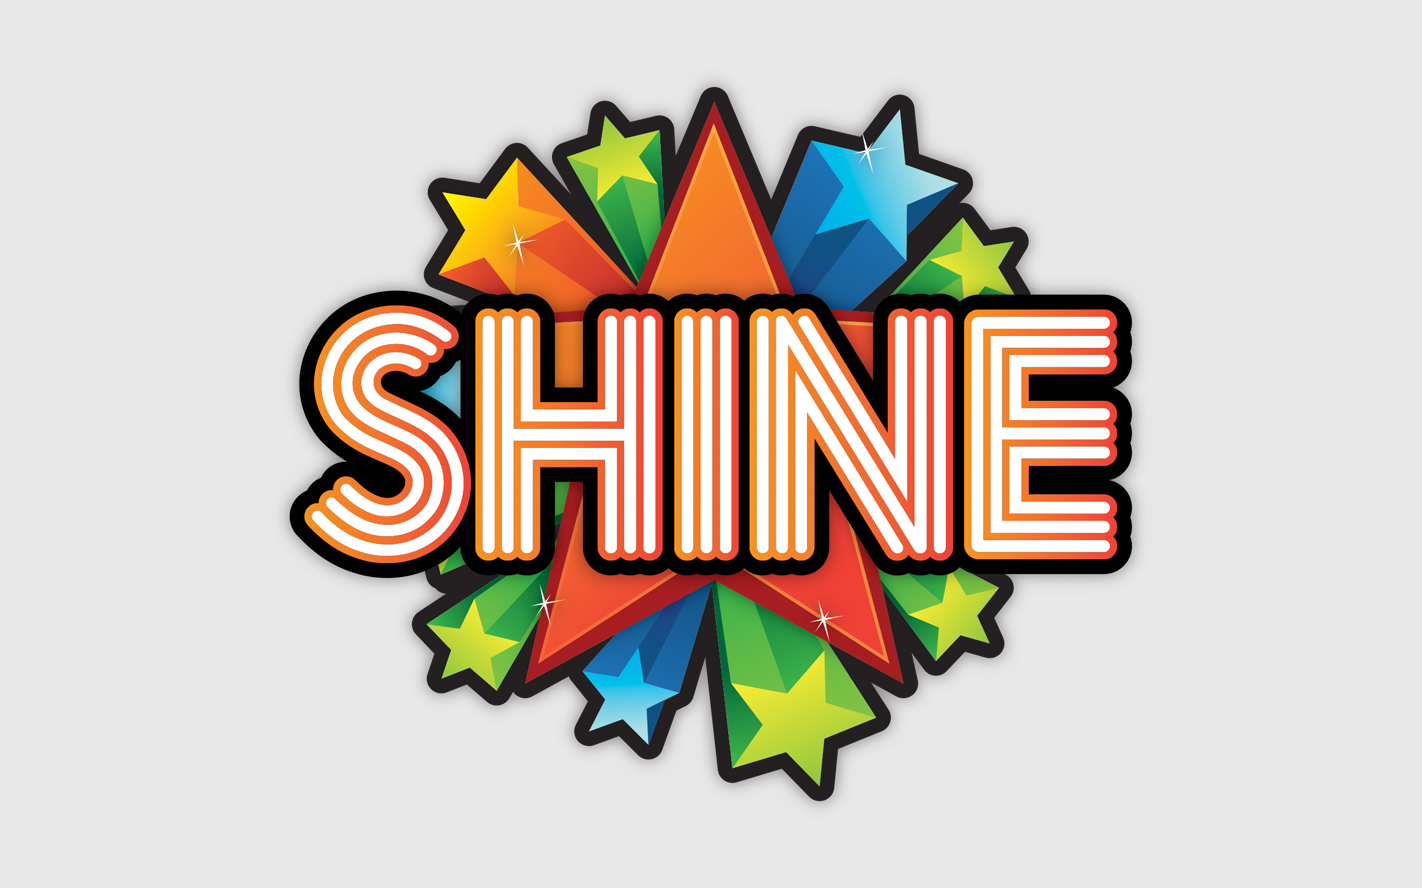 Shine - Learn more